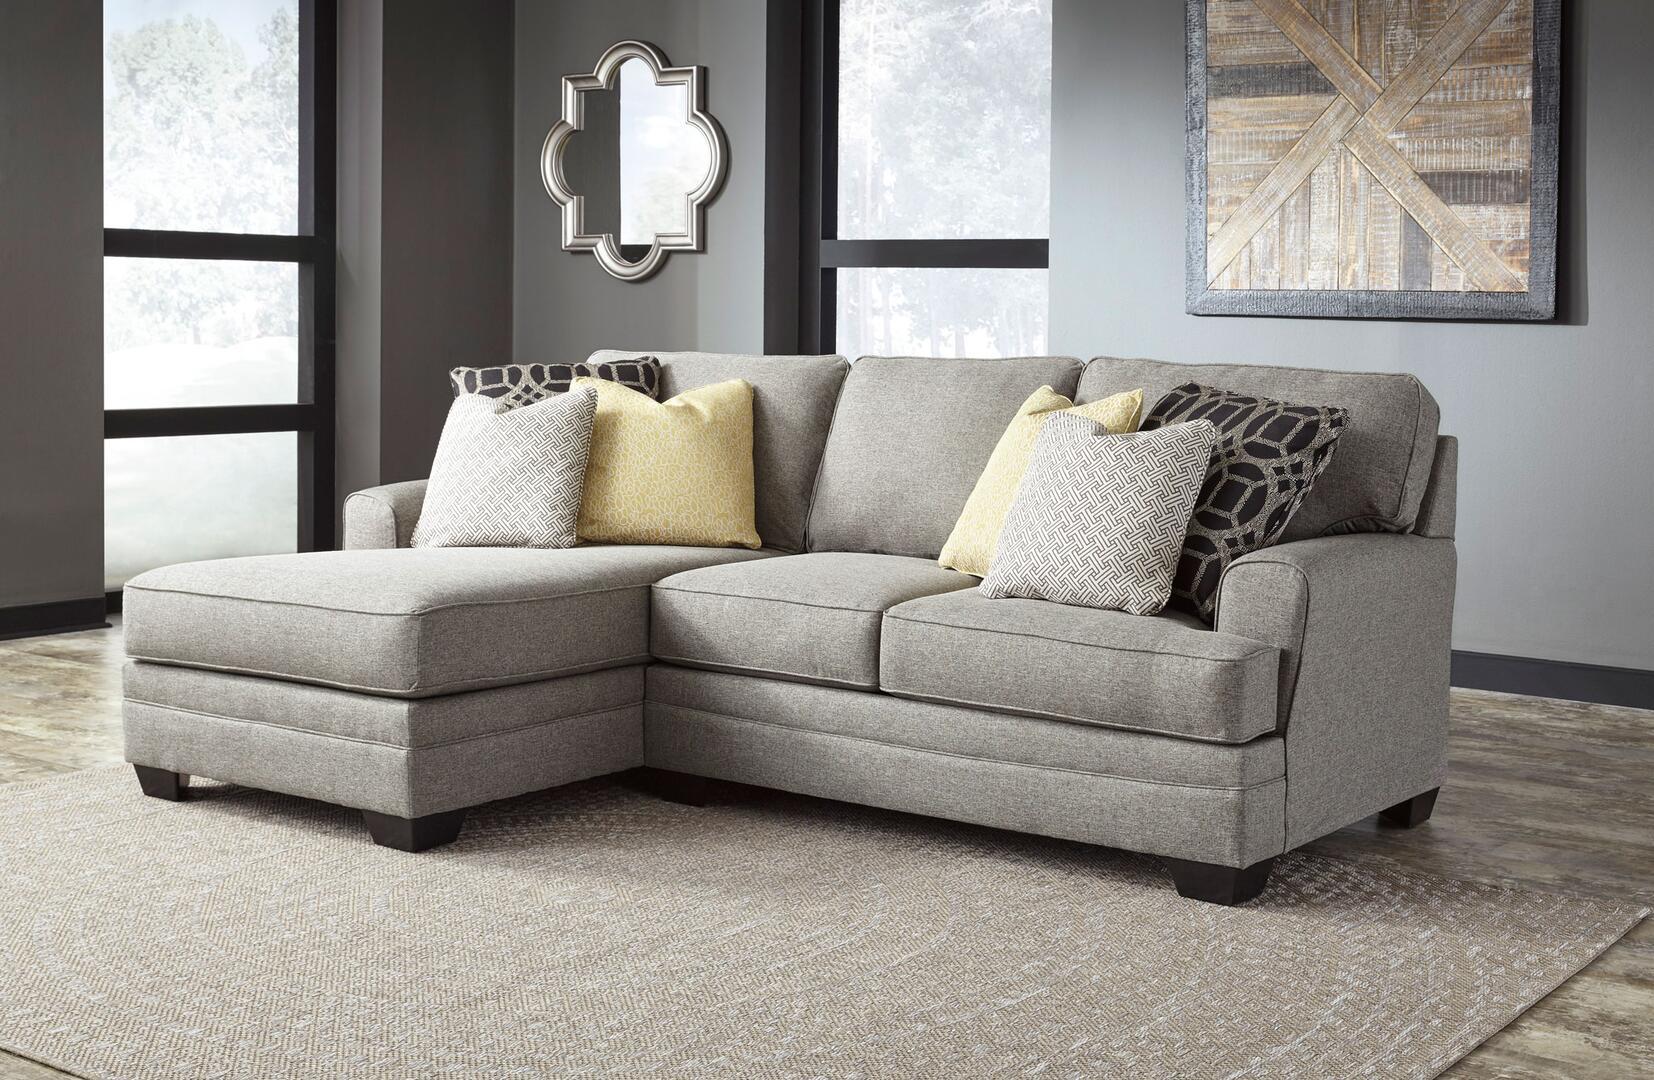 milo corner sofa groupon review blue plaid covers home the honoroak